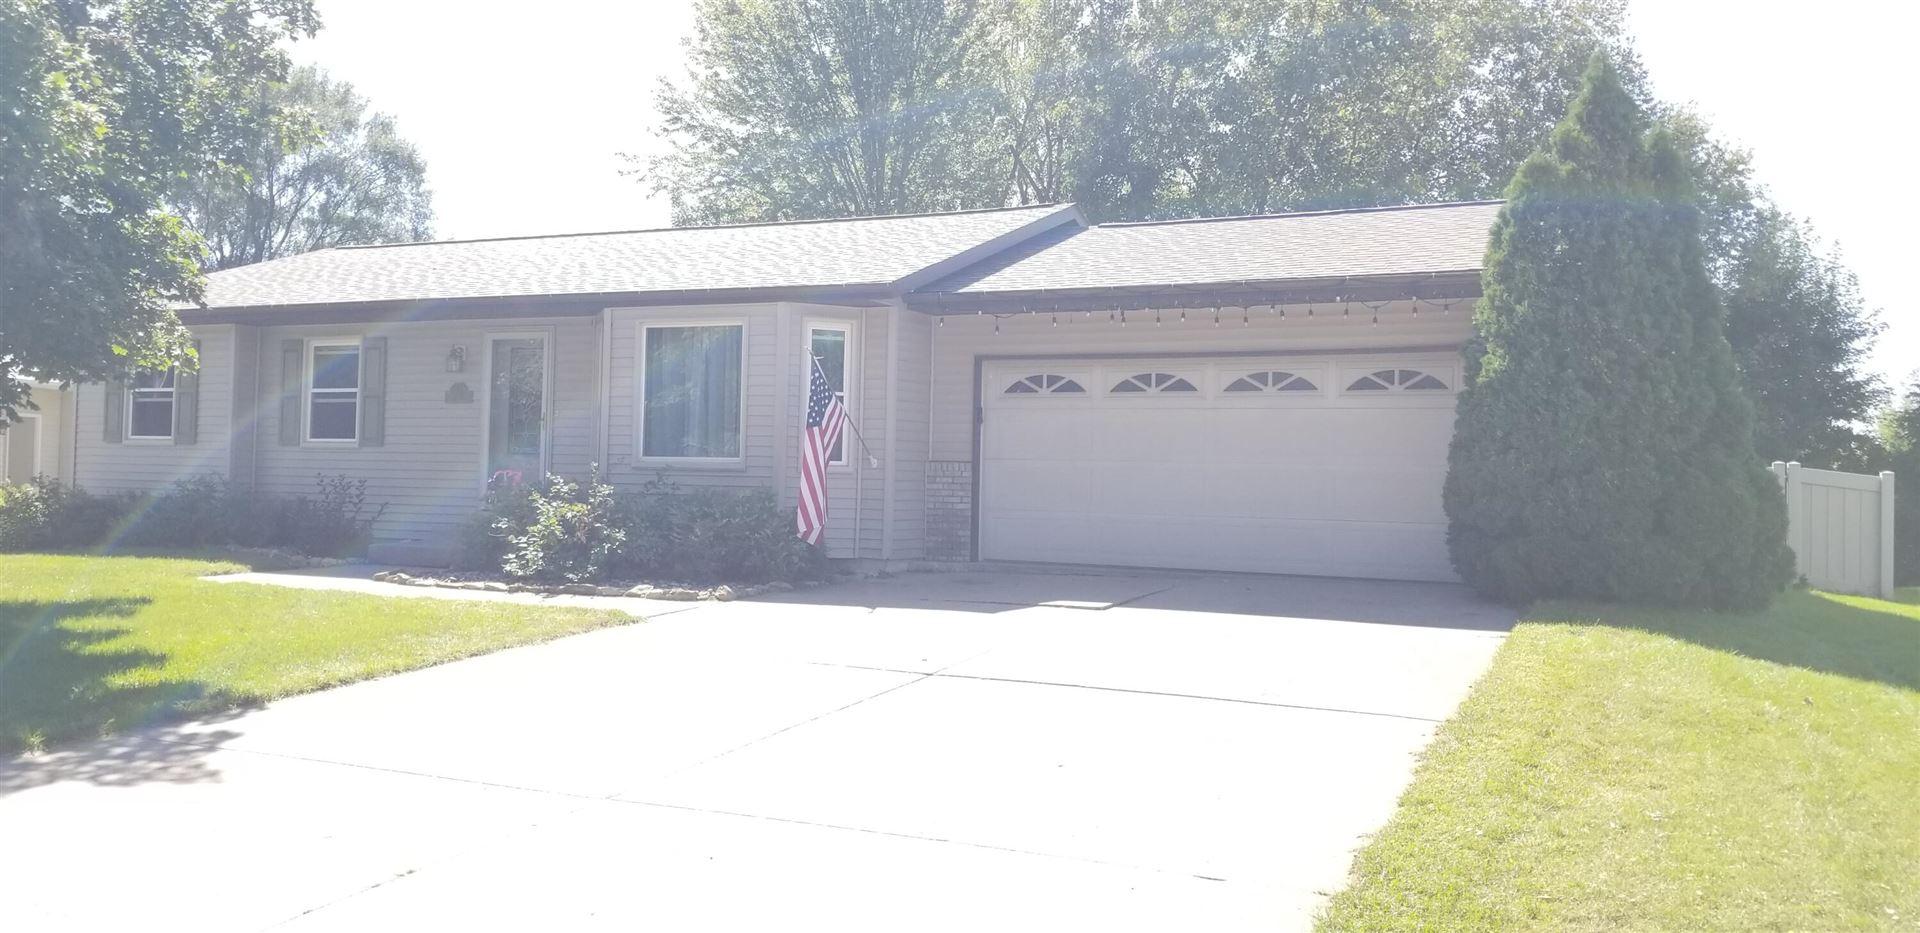 3210 Cedar Ave S, Holmen, WI 54636 - MLS#: 1763521